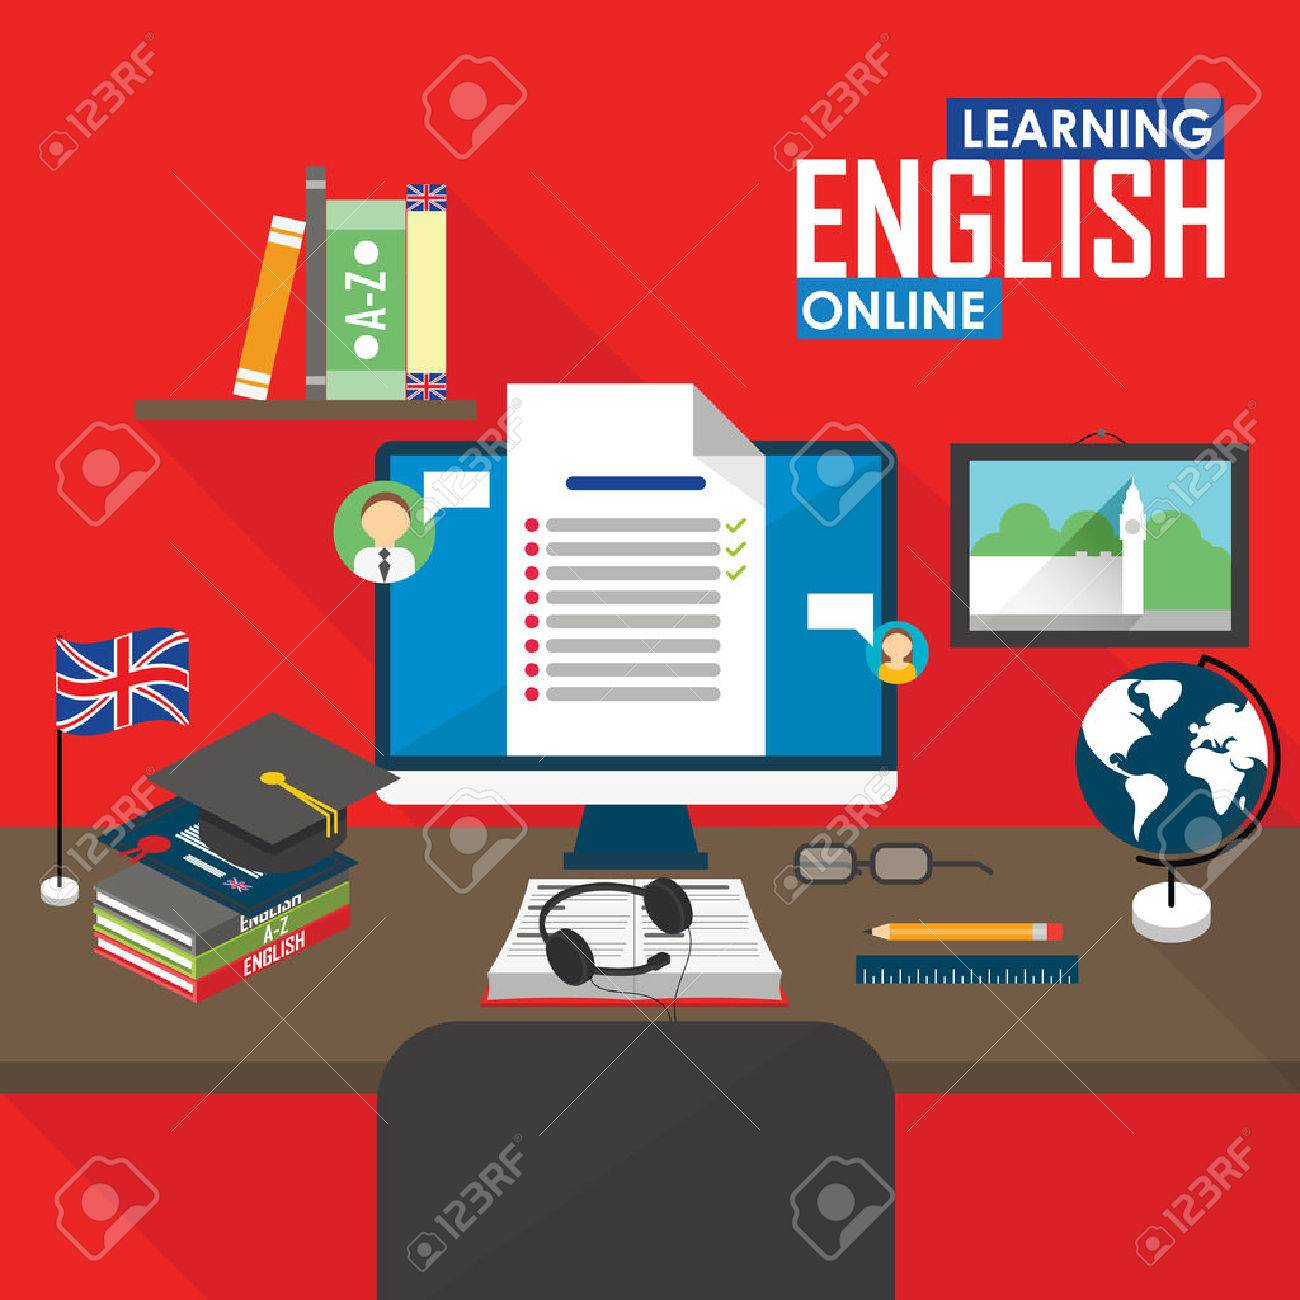 online+education+programs